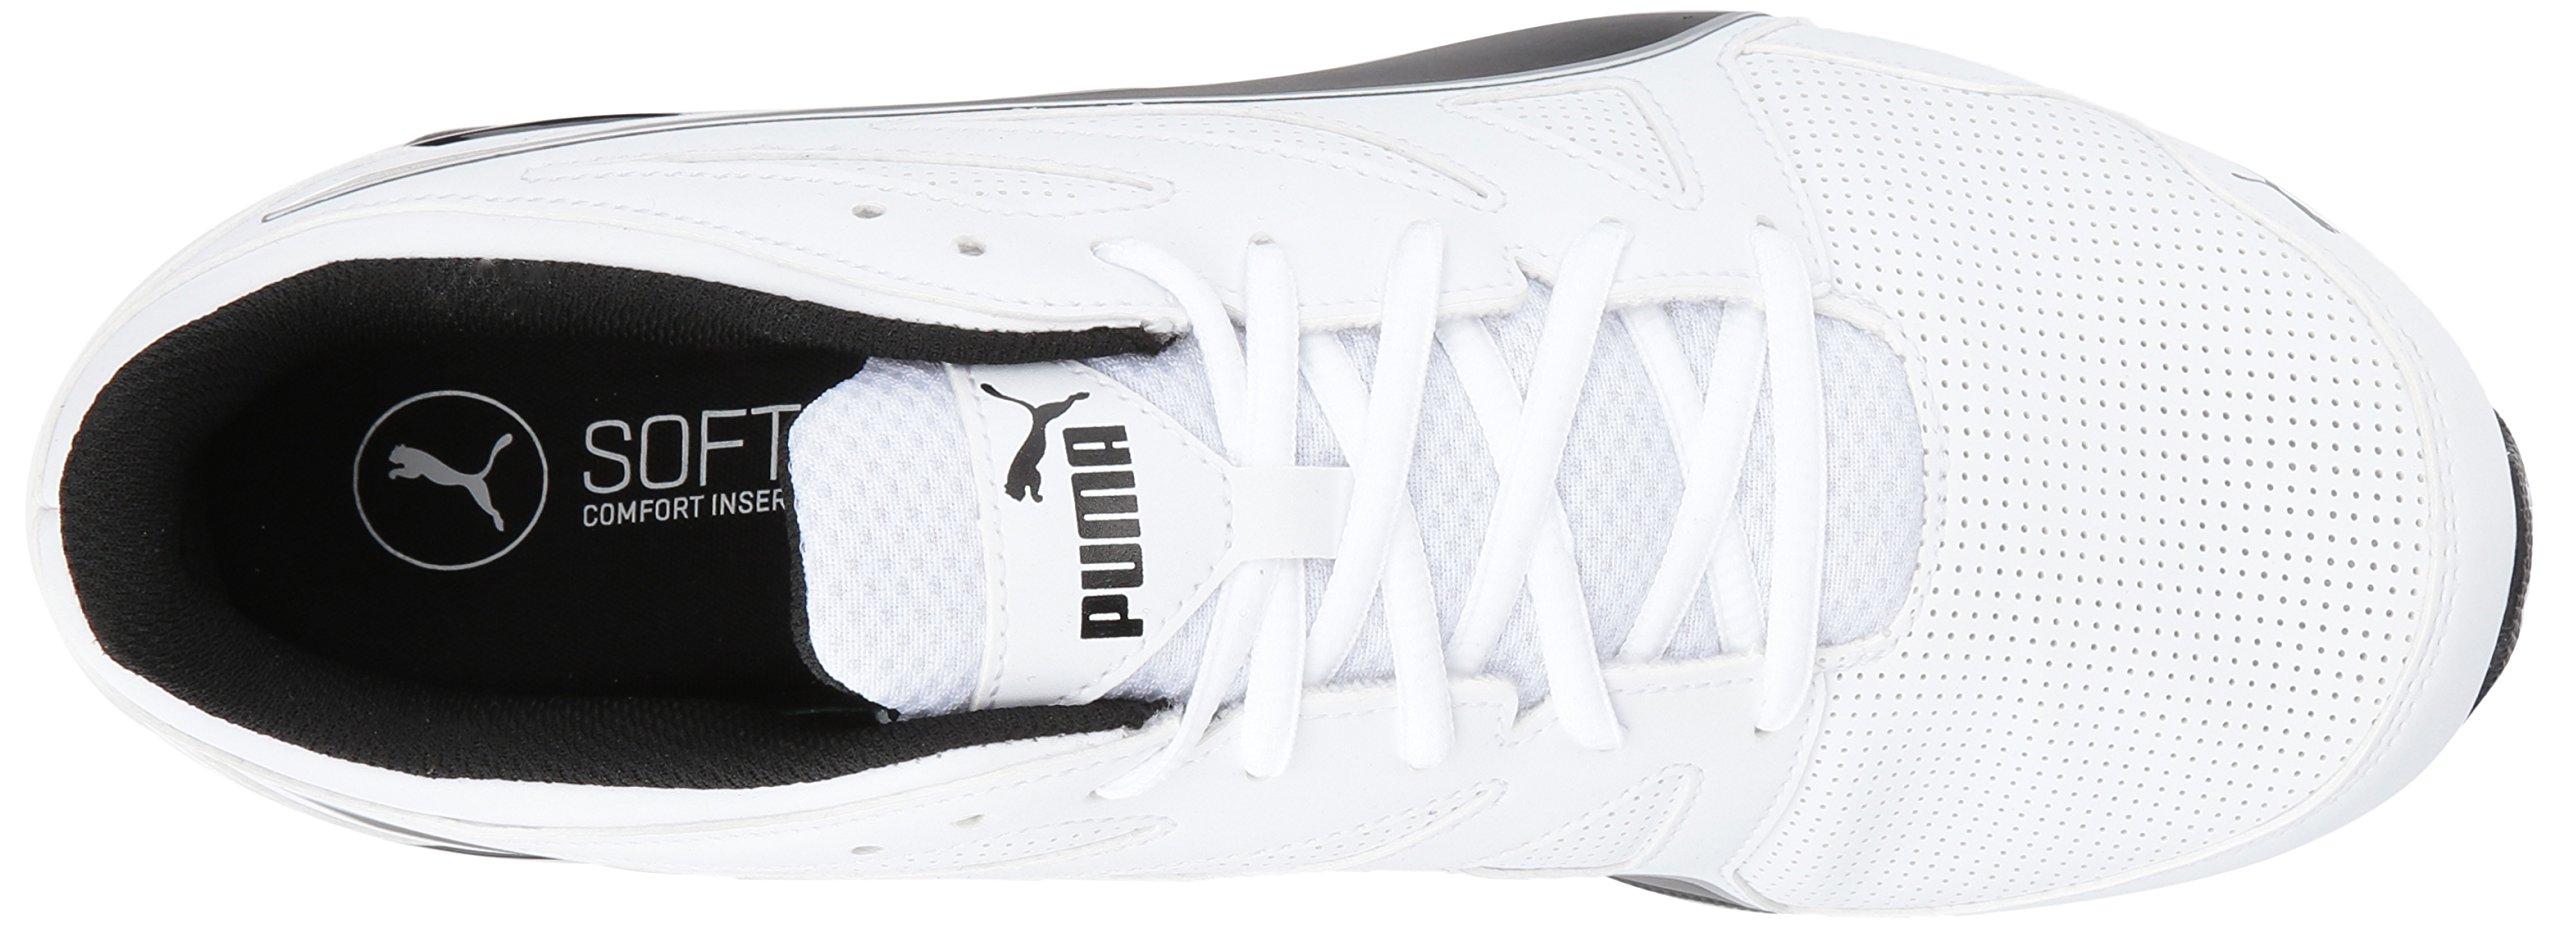 premium selection 753d0 9799a PUMA Men s Tazon Modern SL FM Sneaker,puma white-puma black,10.5 M US -  19029608-100-10.5 M US   Fashion Sneakers   Clothing, Shoes   Jewelry - tibs